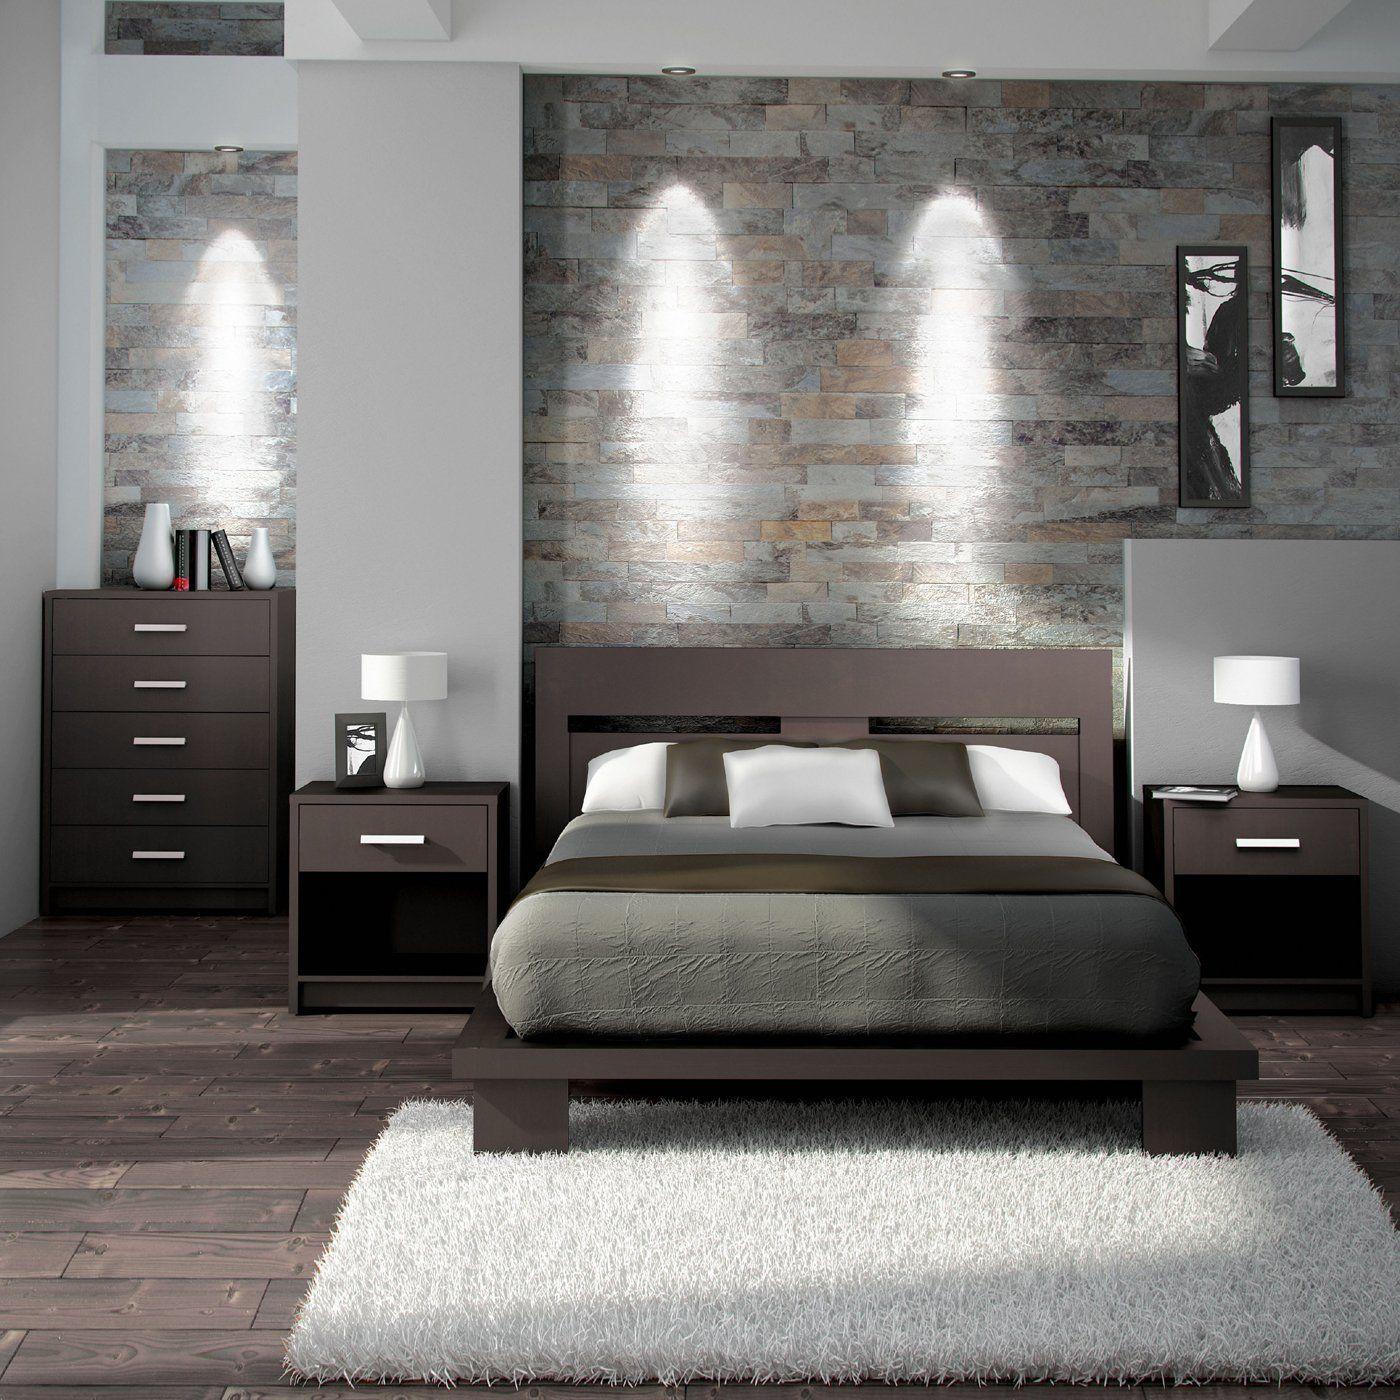 Black Bedroom Ideas Inspiration For Master Bedroom Designs Stylendesigns Modern Bedroom Set Contemporary Bedroom Contemporary Bedroom Furniture